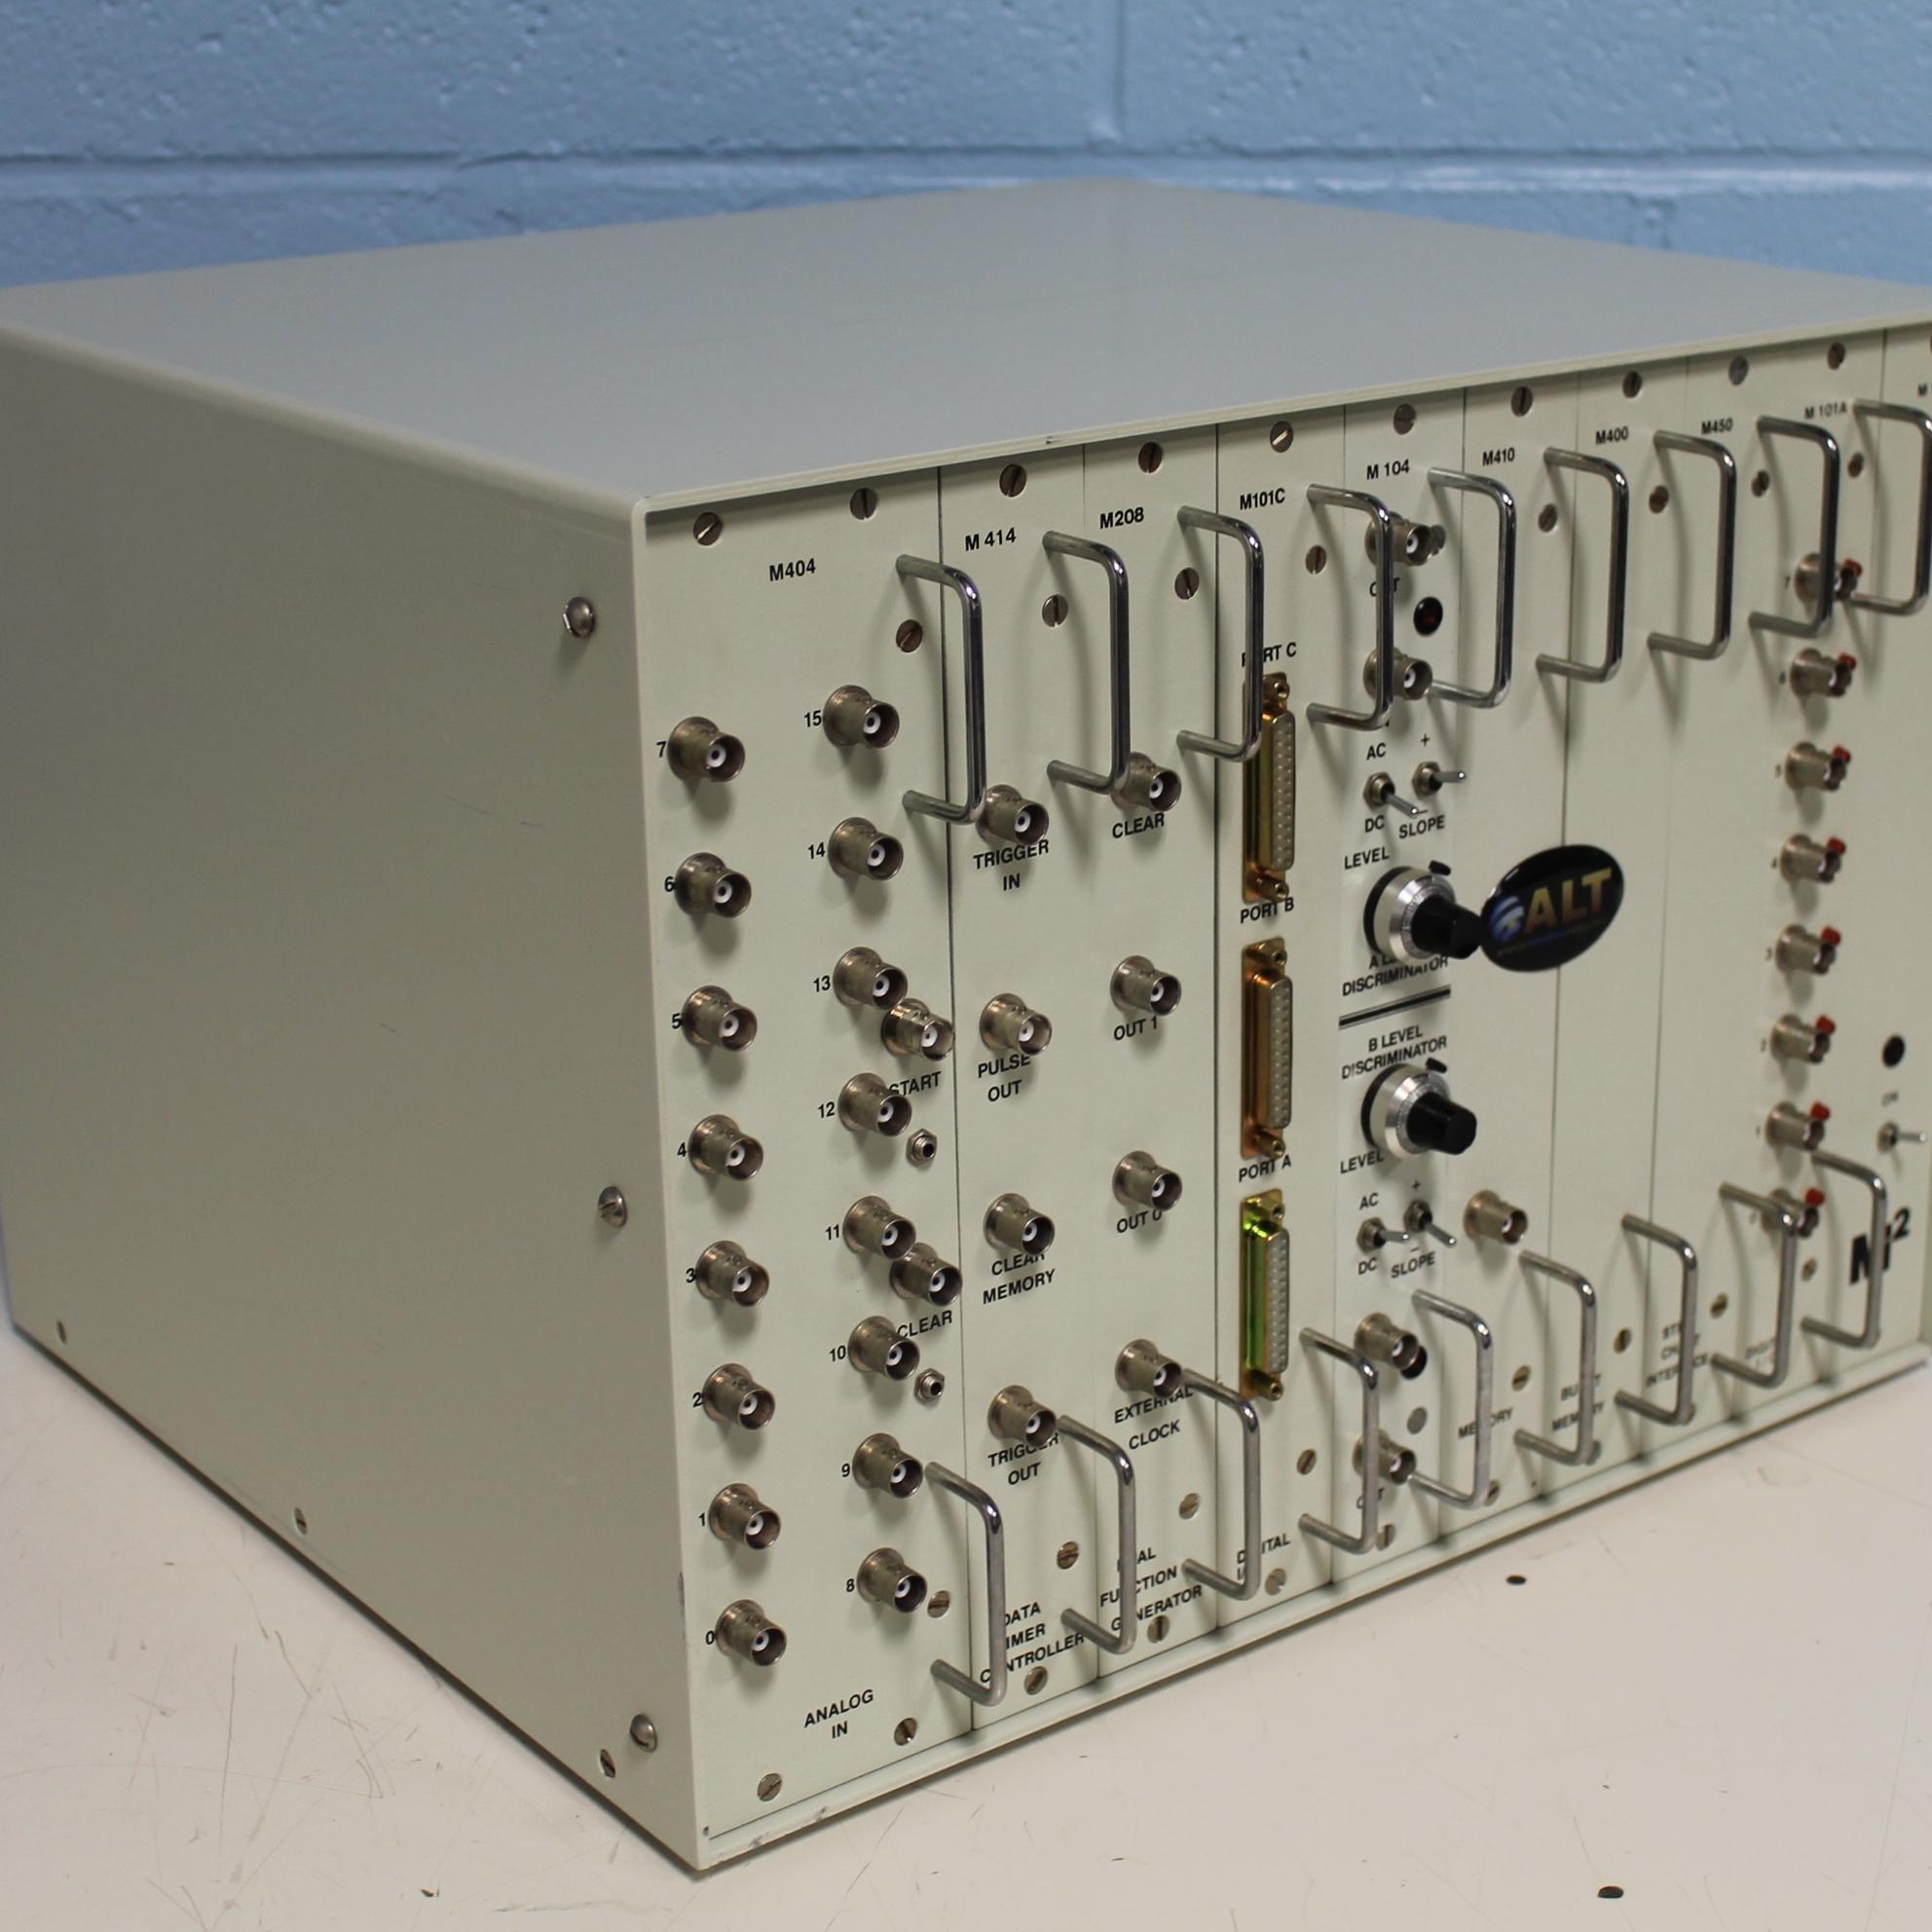 Modular Instruments Inc. MI2 Micro5000 Rack Image